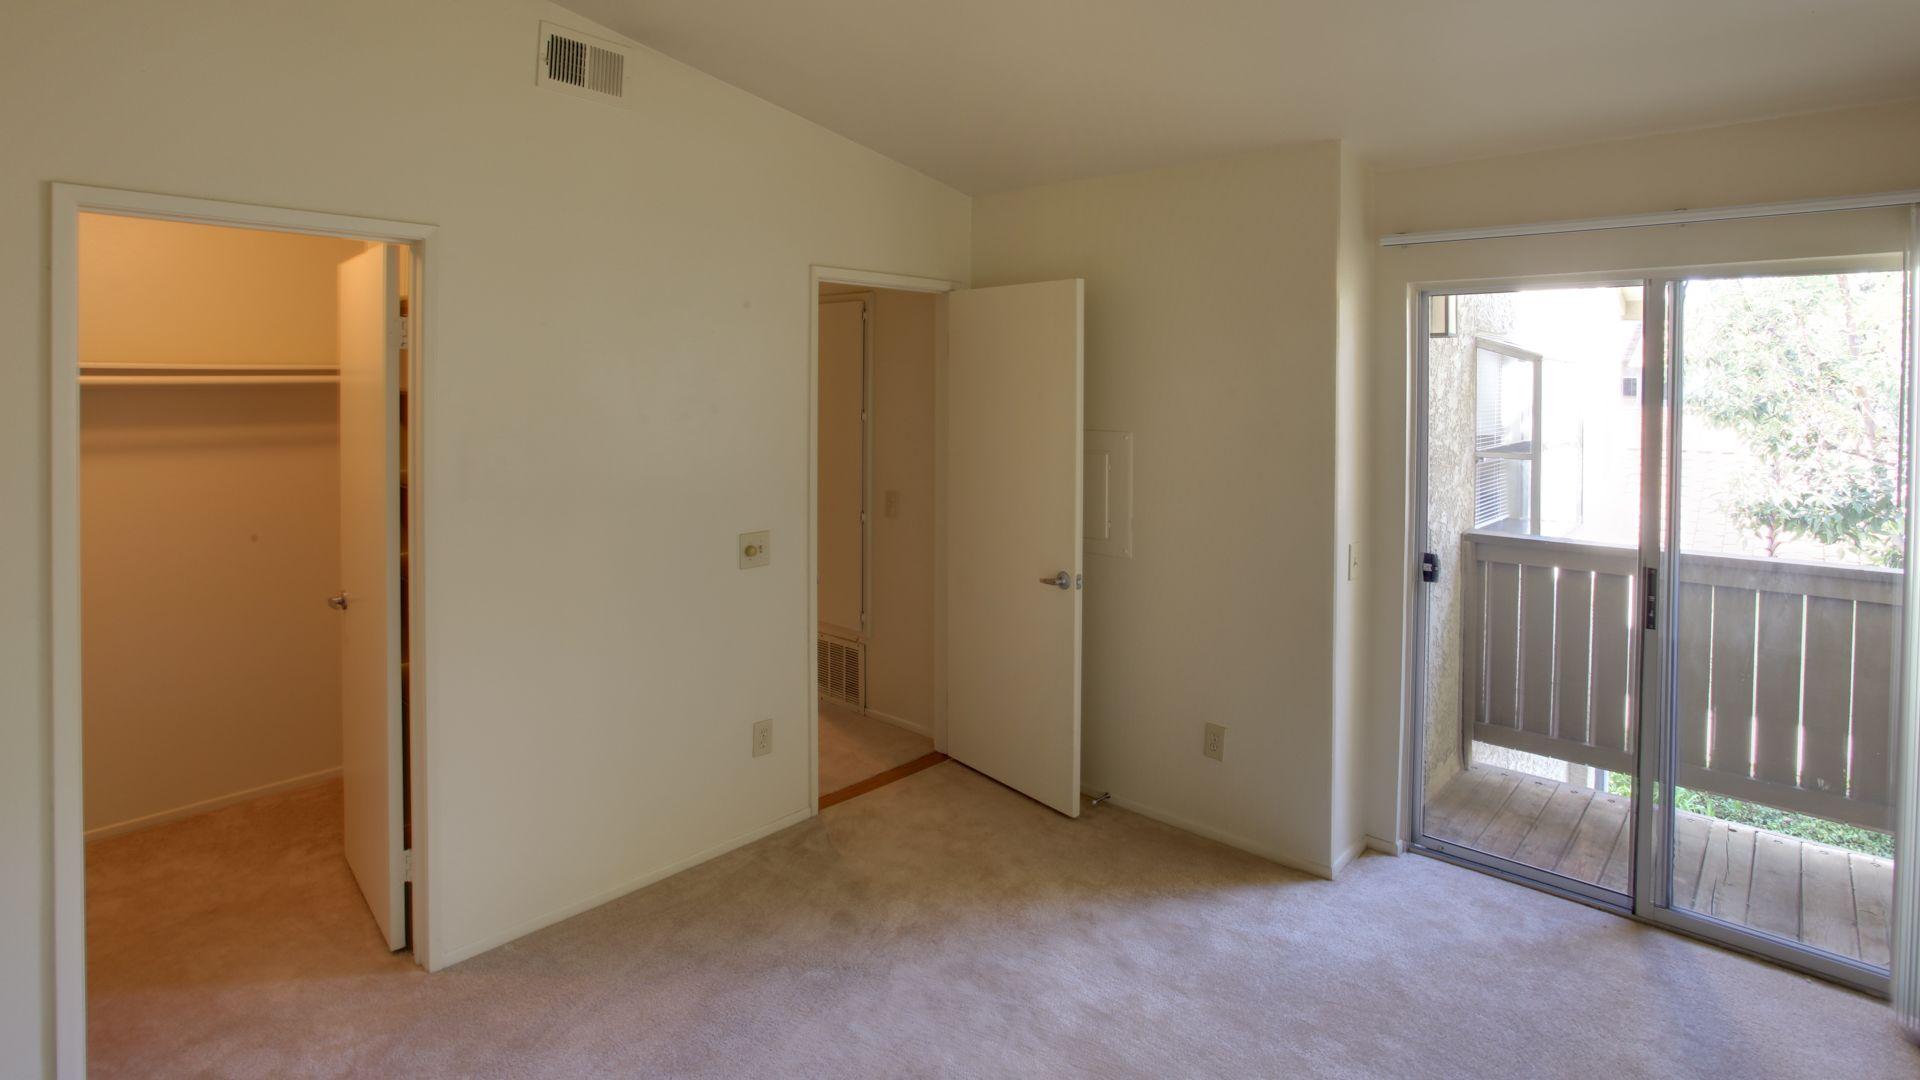 Windridge Apartments - Bedroom